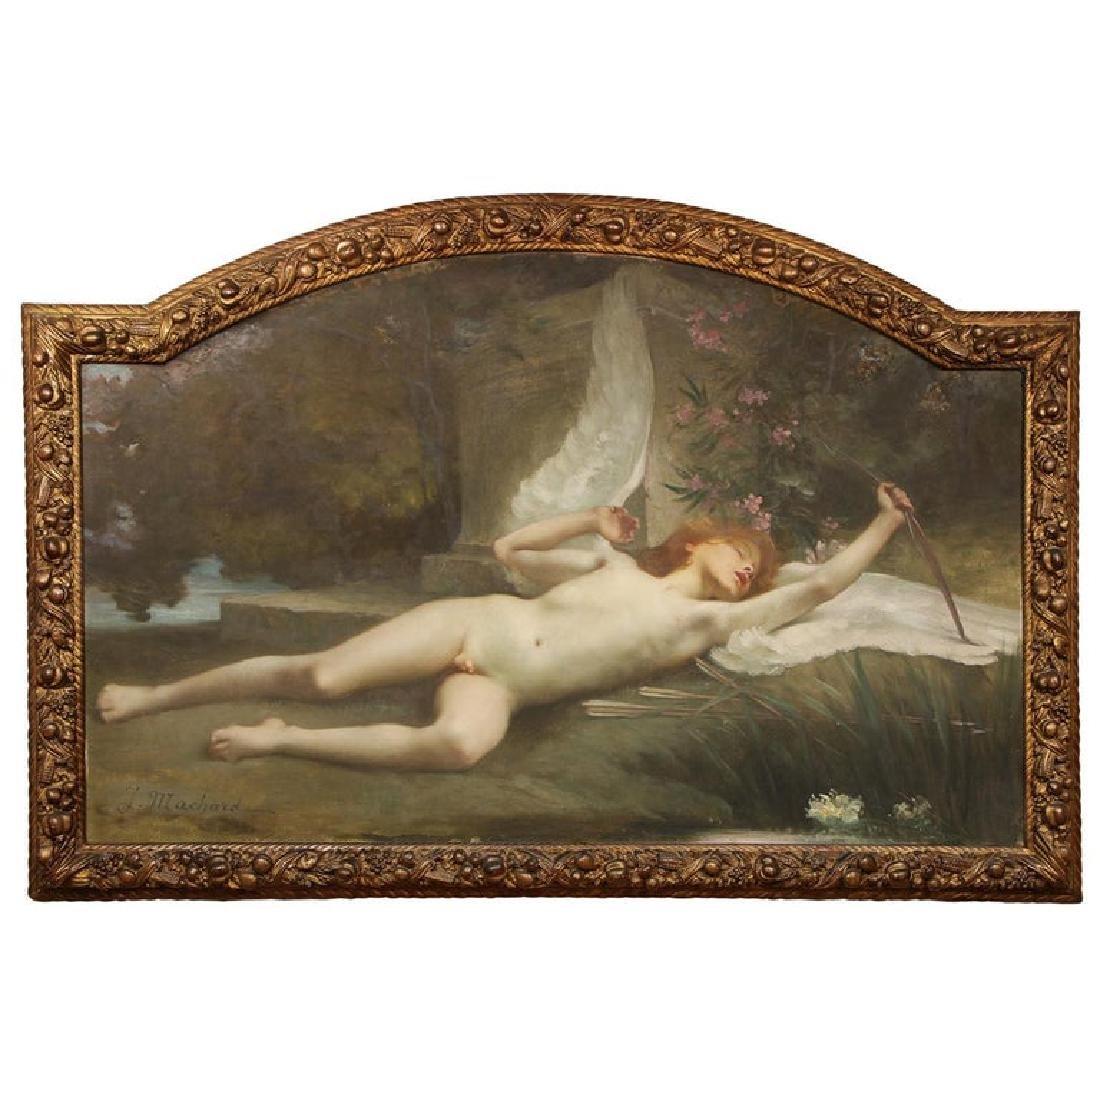 "Jules-Louis Machard ""Dream of Eros"" Exceptional Oil"